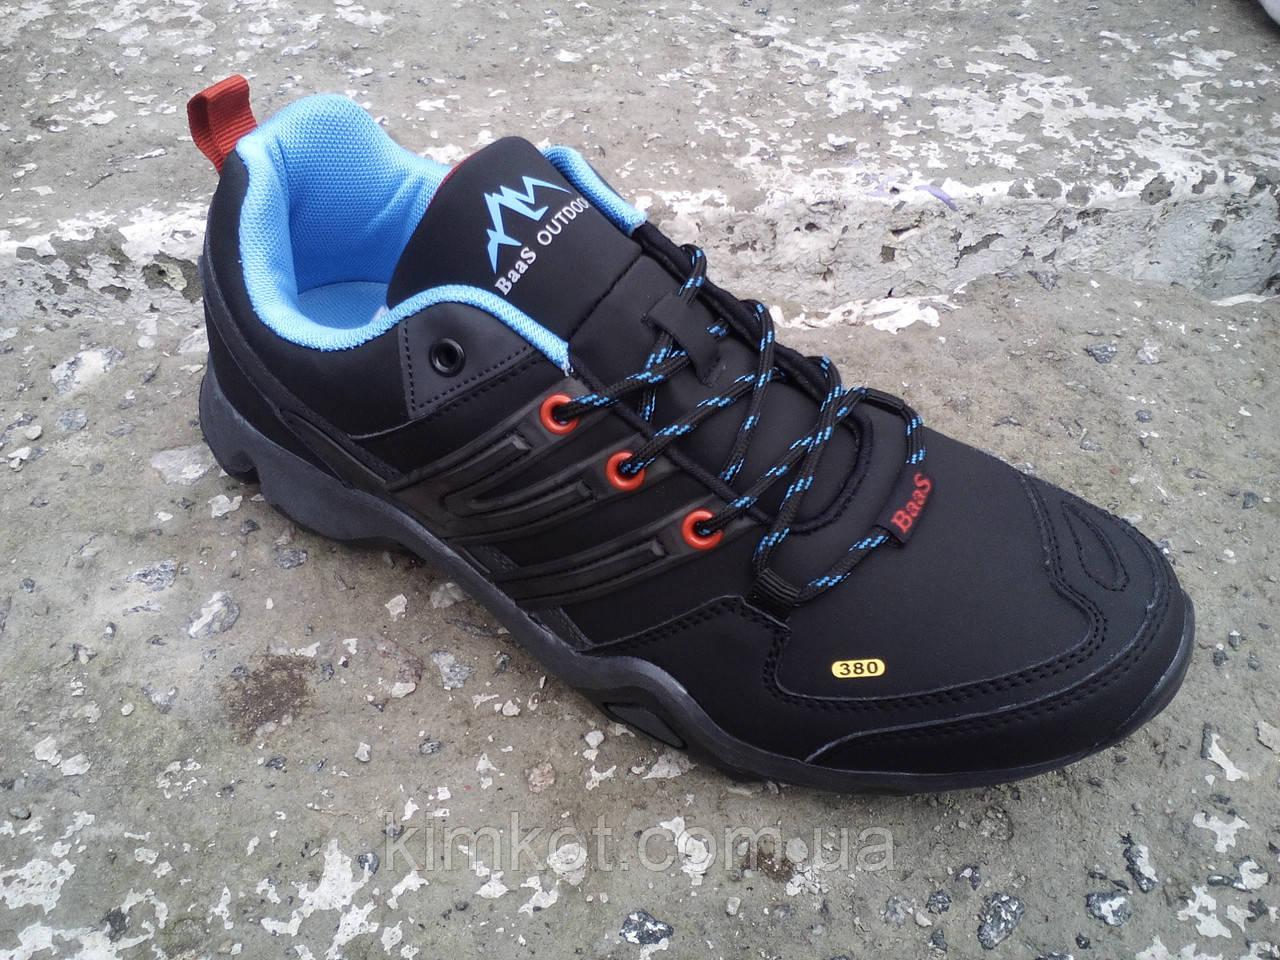 e9f4298f Кроссовки мужские Adidas TERREX BAAS 40 -45 р-р - Интернет-Магазин